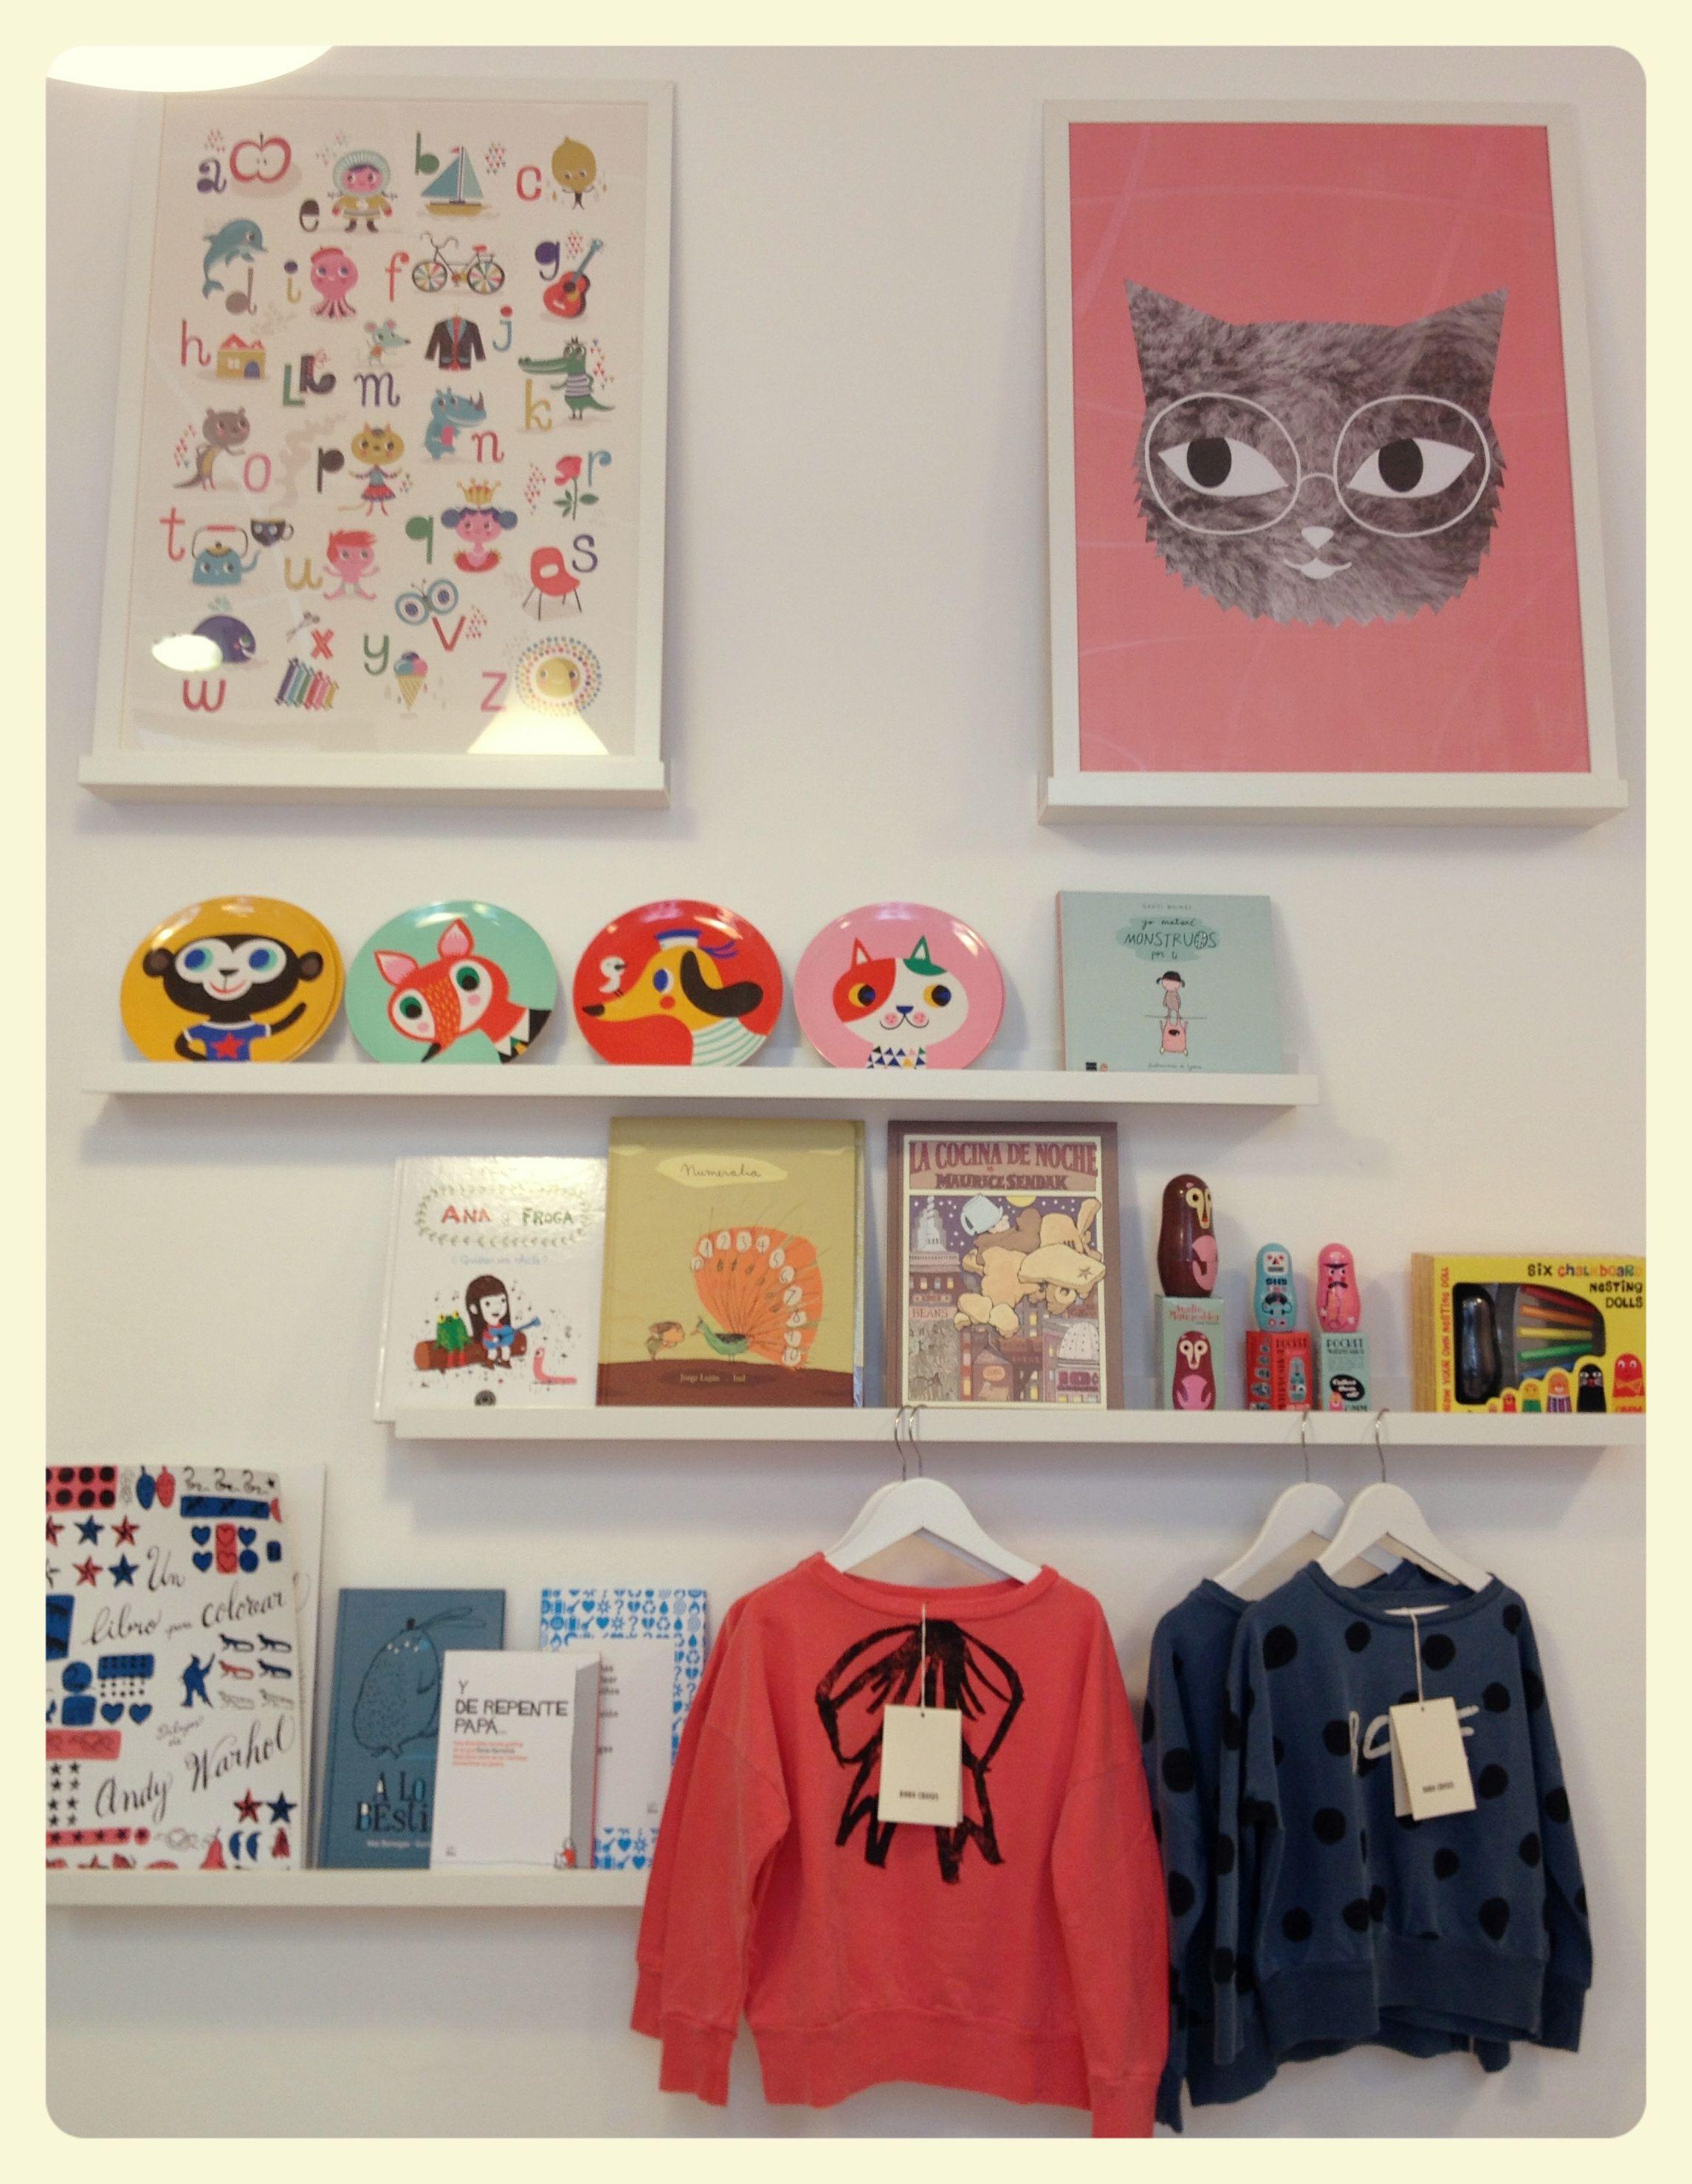 Ribba el estante de ikea que decora habitaciones infantiles for Estanteria pared infantil